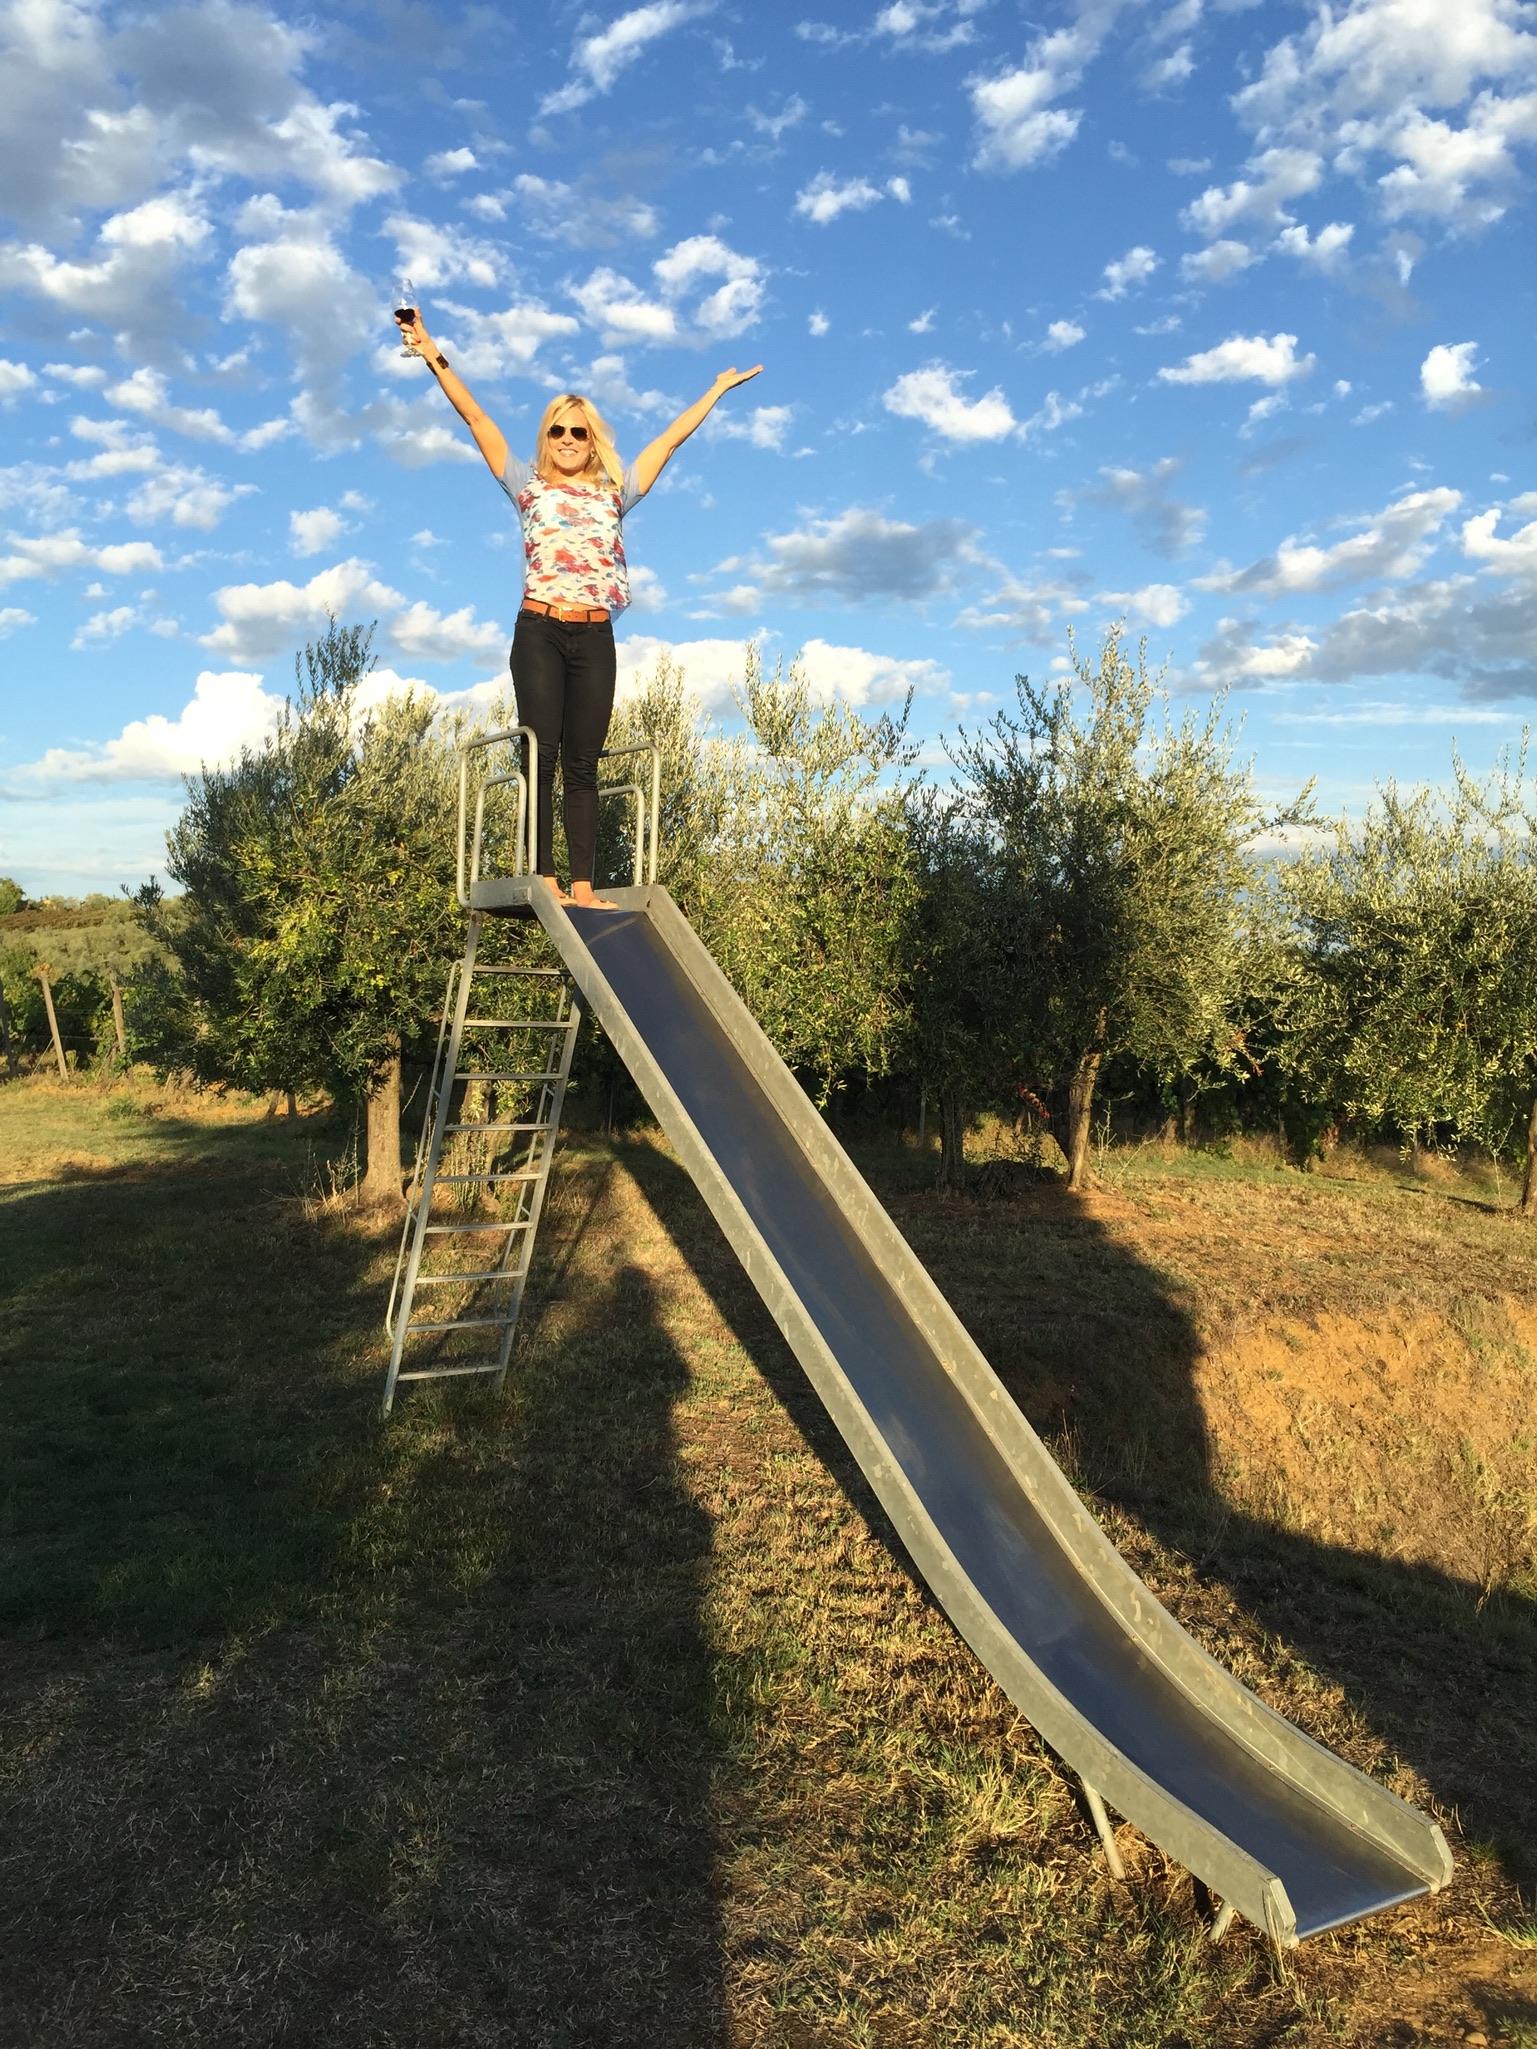 www.annakooiman.com fitness travel lifestyle tuscany chianti wine grapes vineyard olives italy